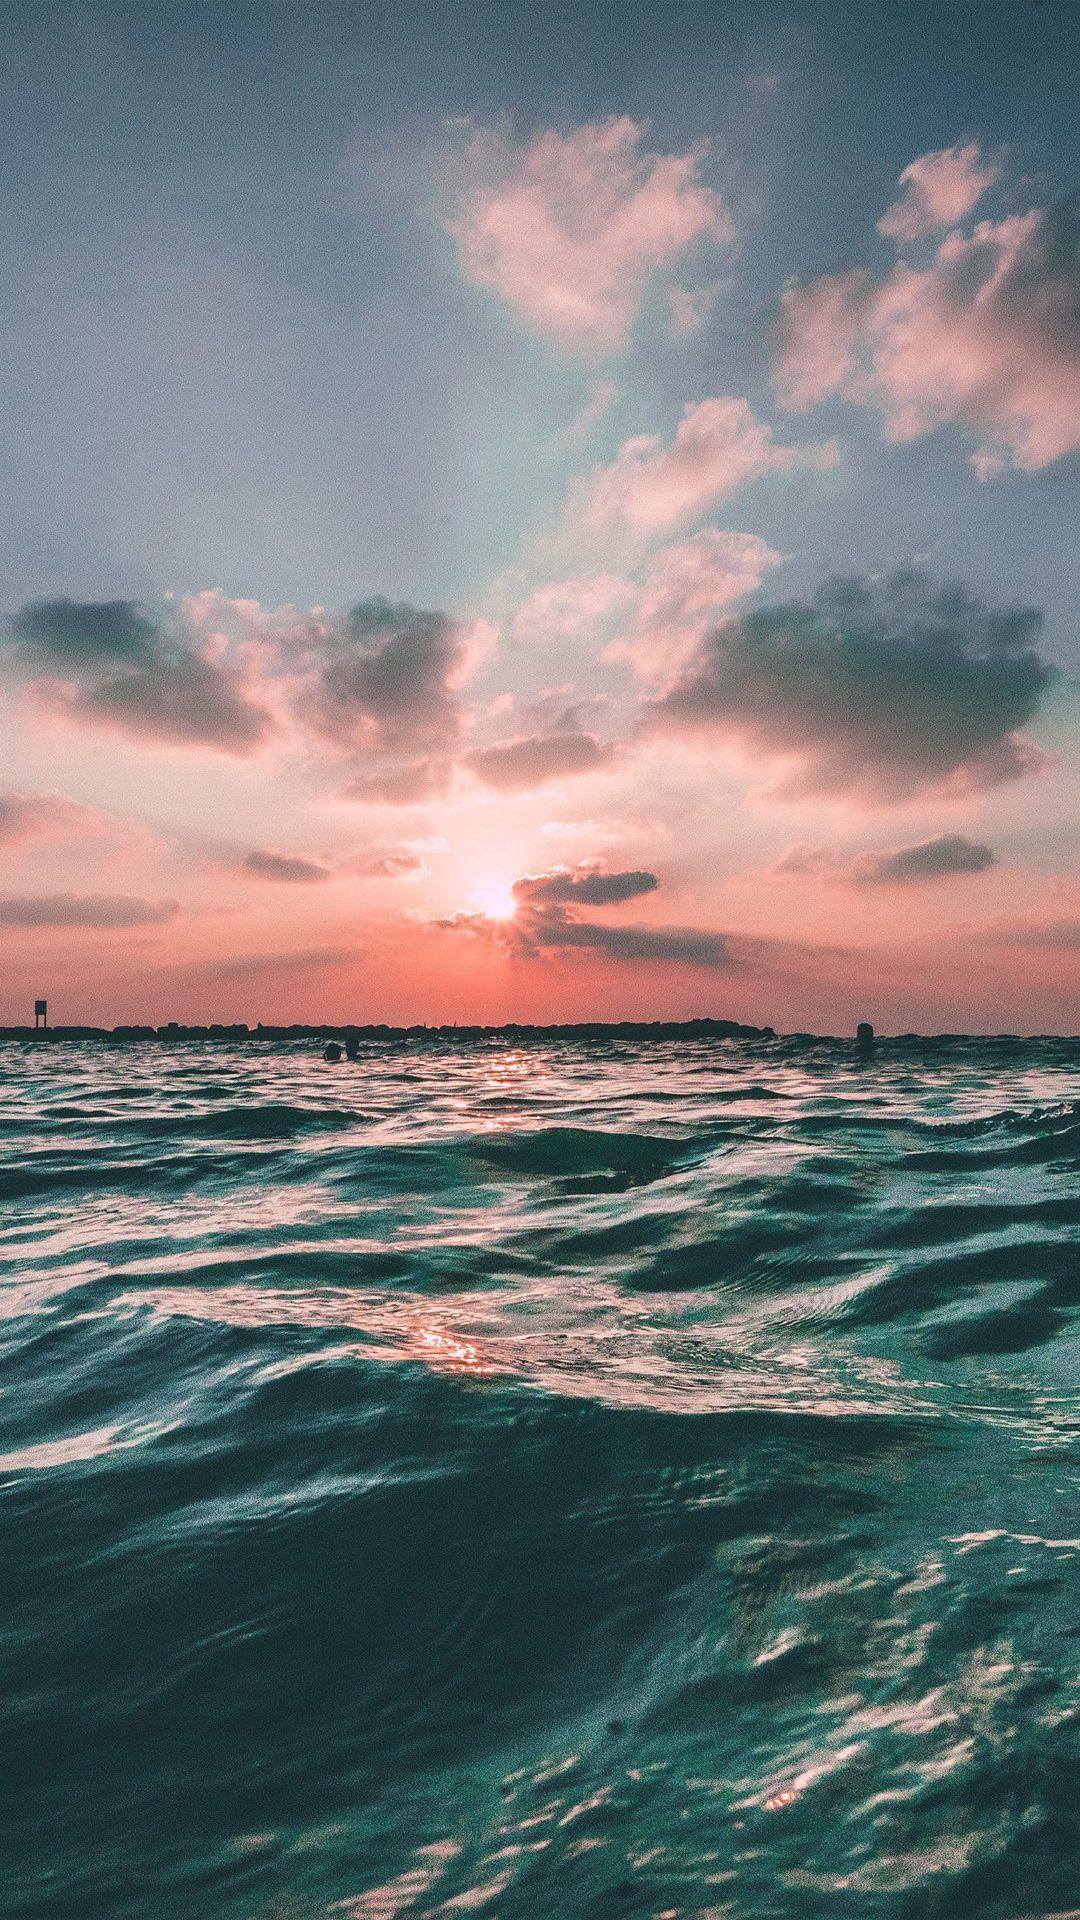 Ocean Sunset Foamy Waves Iphone 5 Wallpaper Nature Iphone Wallpaper Iphone 7 Wallpapers Sunset Wallpaper